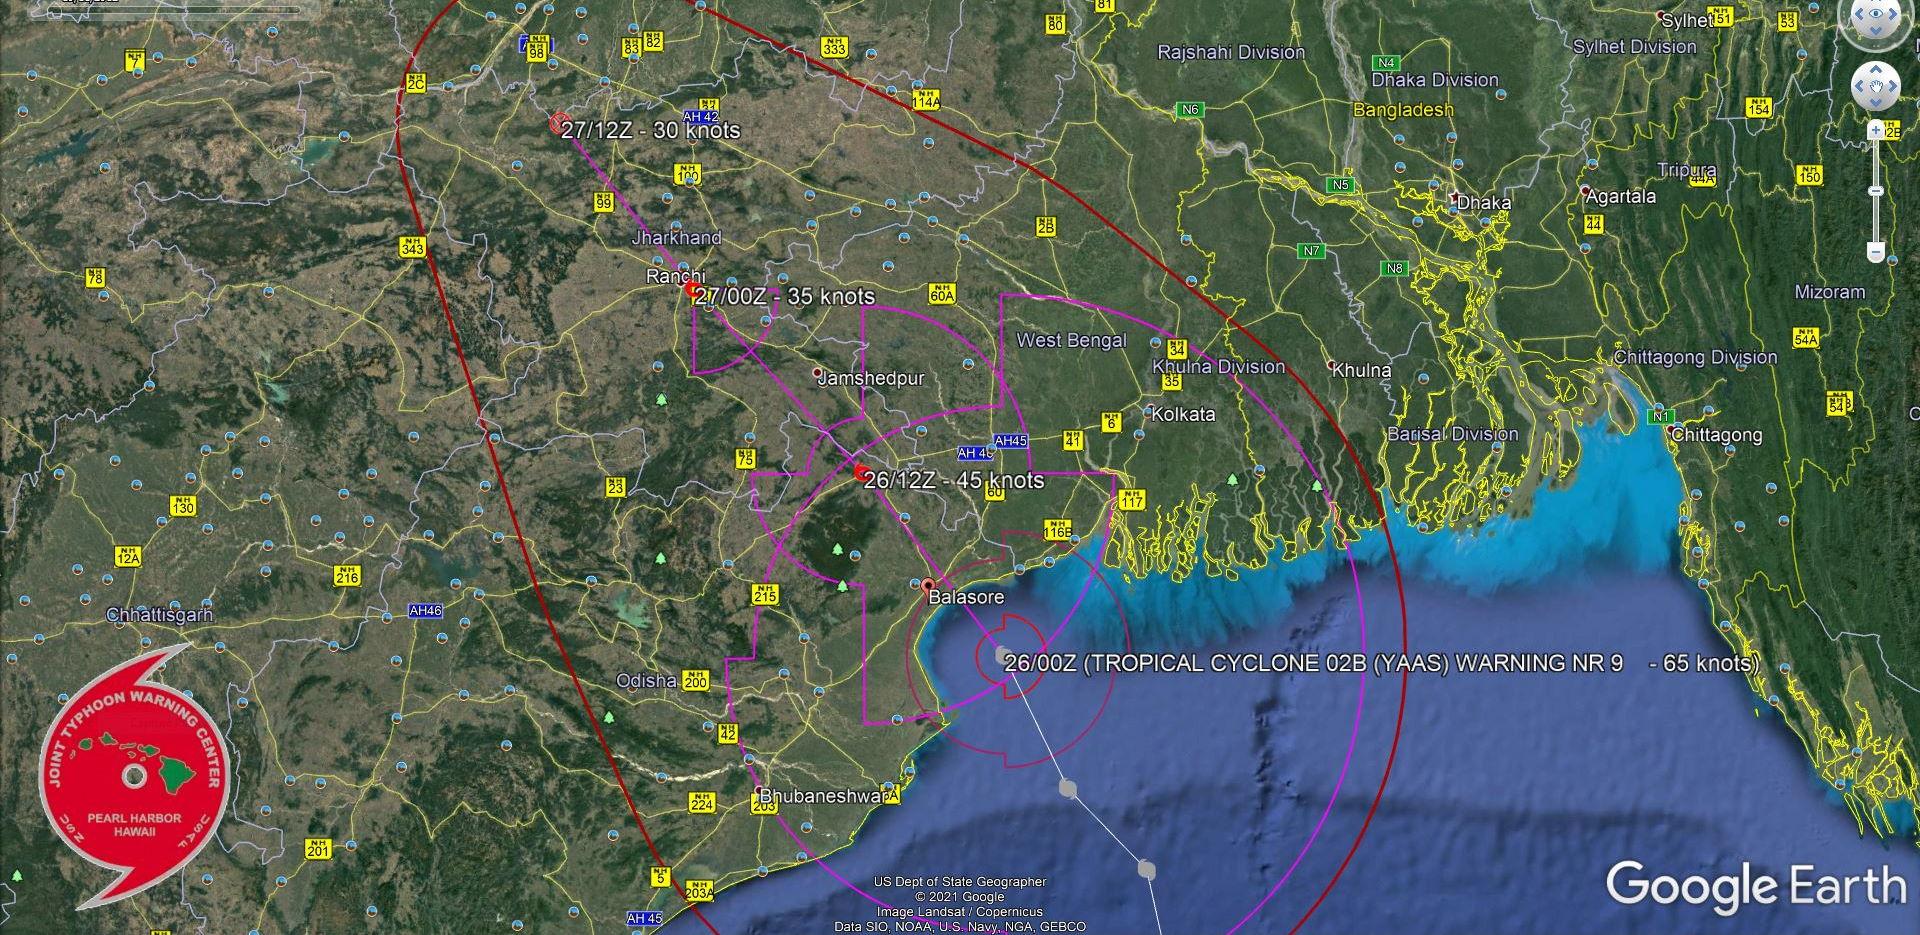 TC 02B(YAAS). WARNING 9. FORECAST LANDFALL AREA NEAR BALASORE/ODISHA WITH 65KNOT SUSTAINED WINDS.